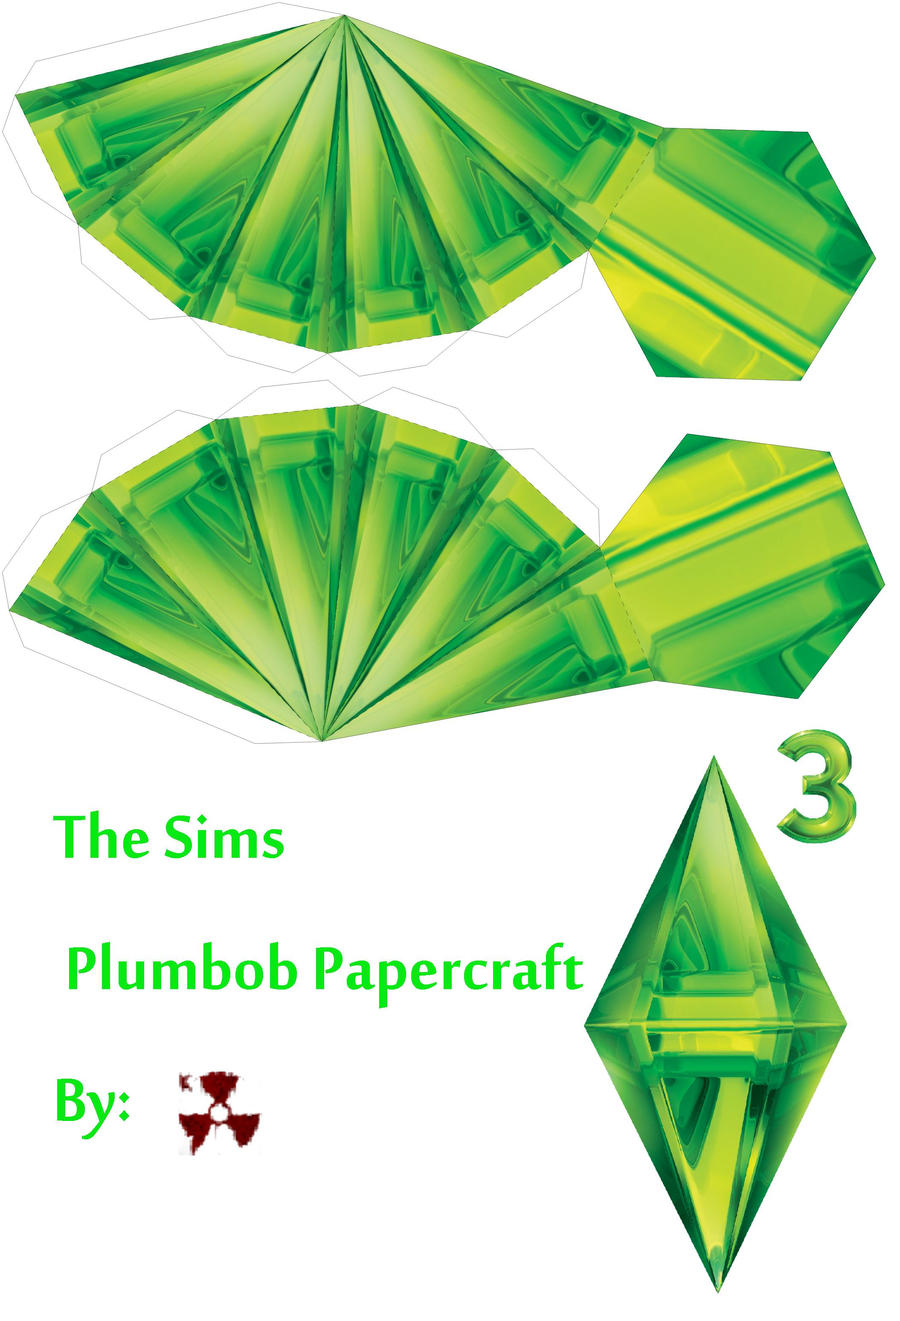 The Sims Plumbob Papercraft by killero94